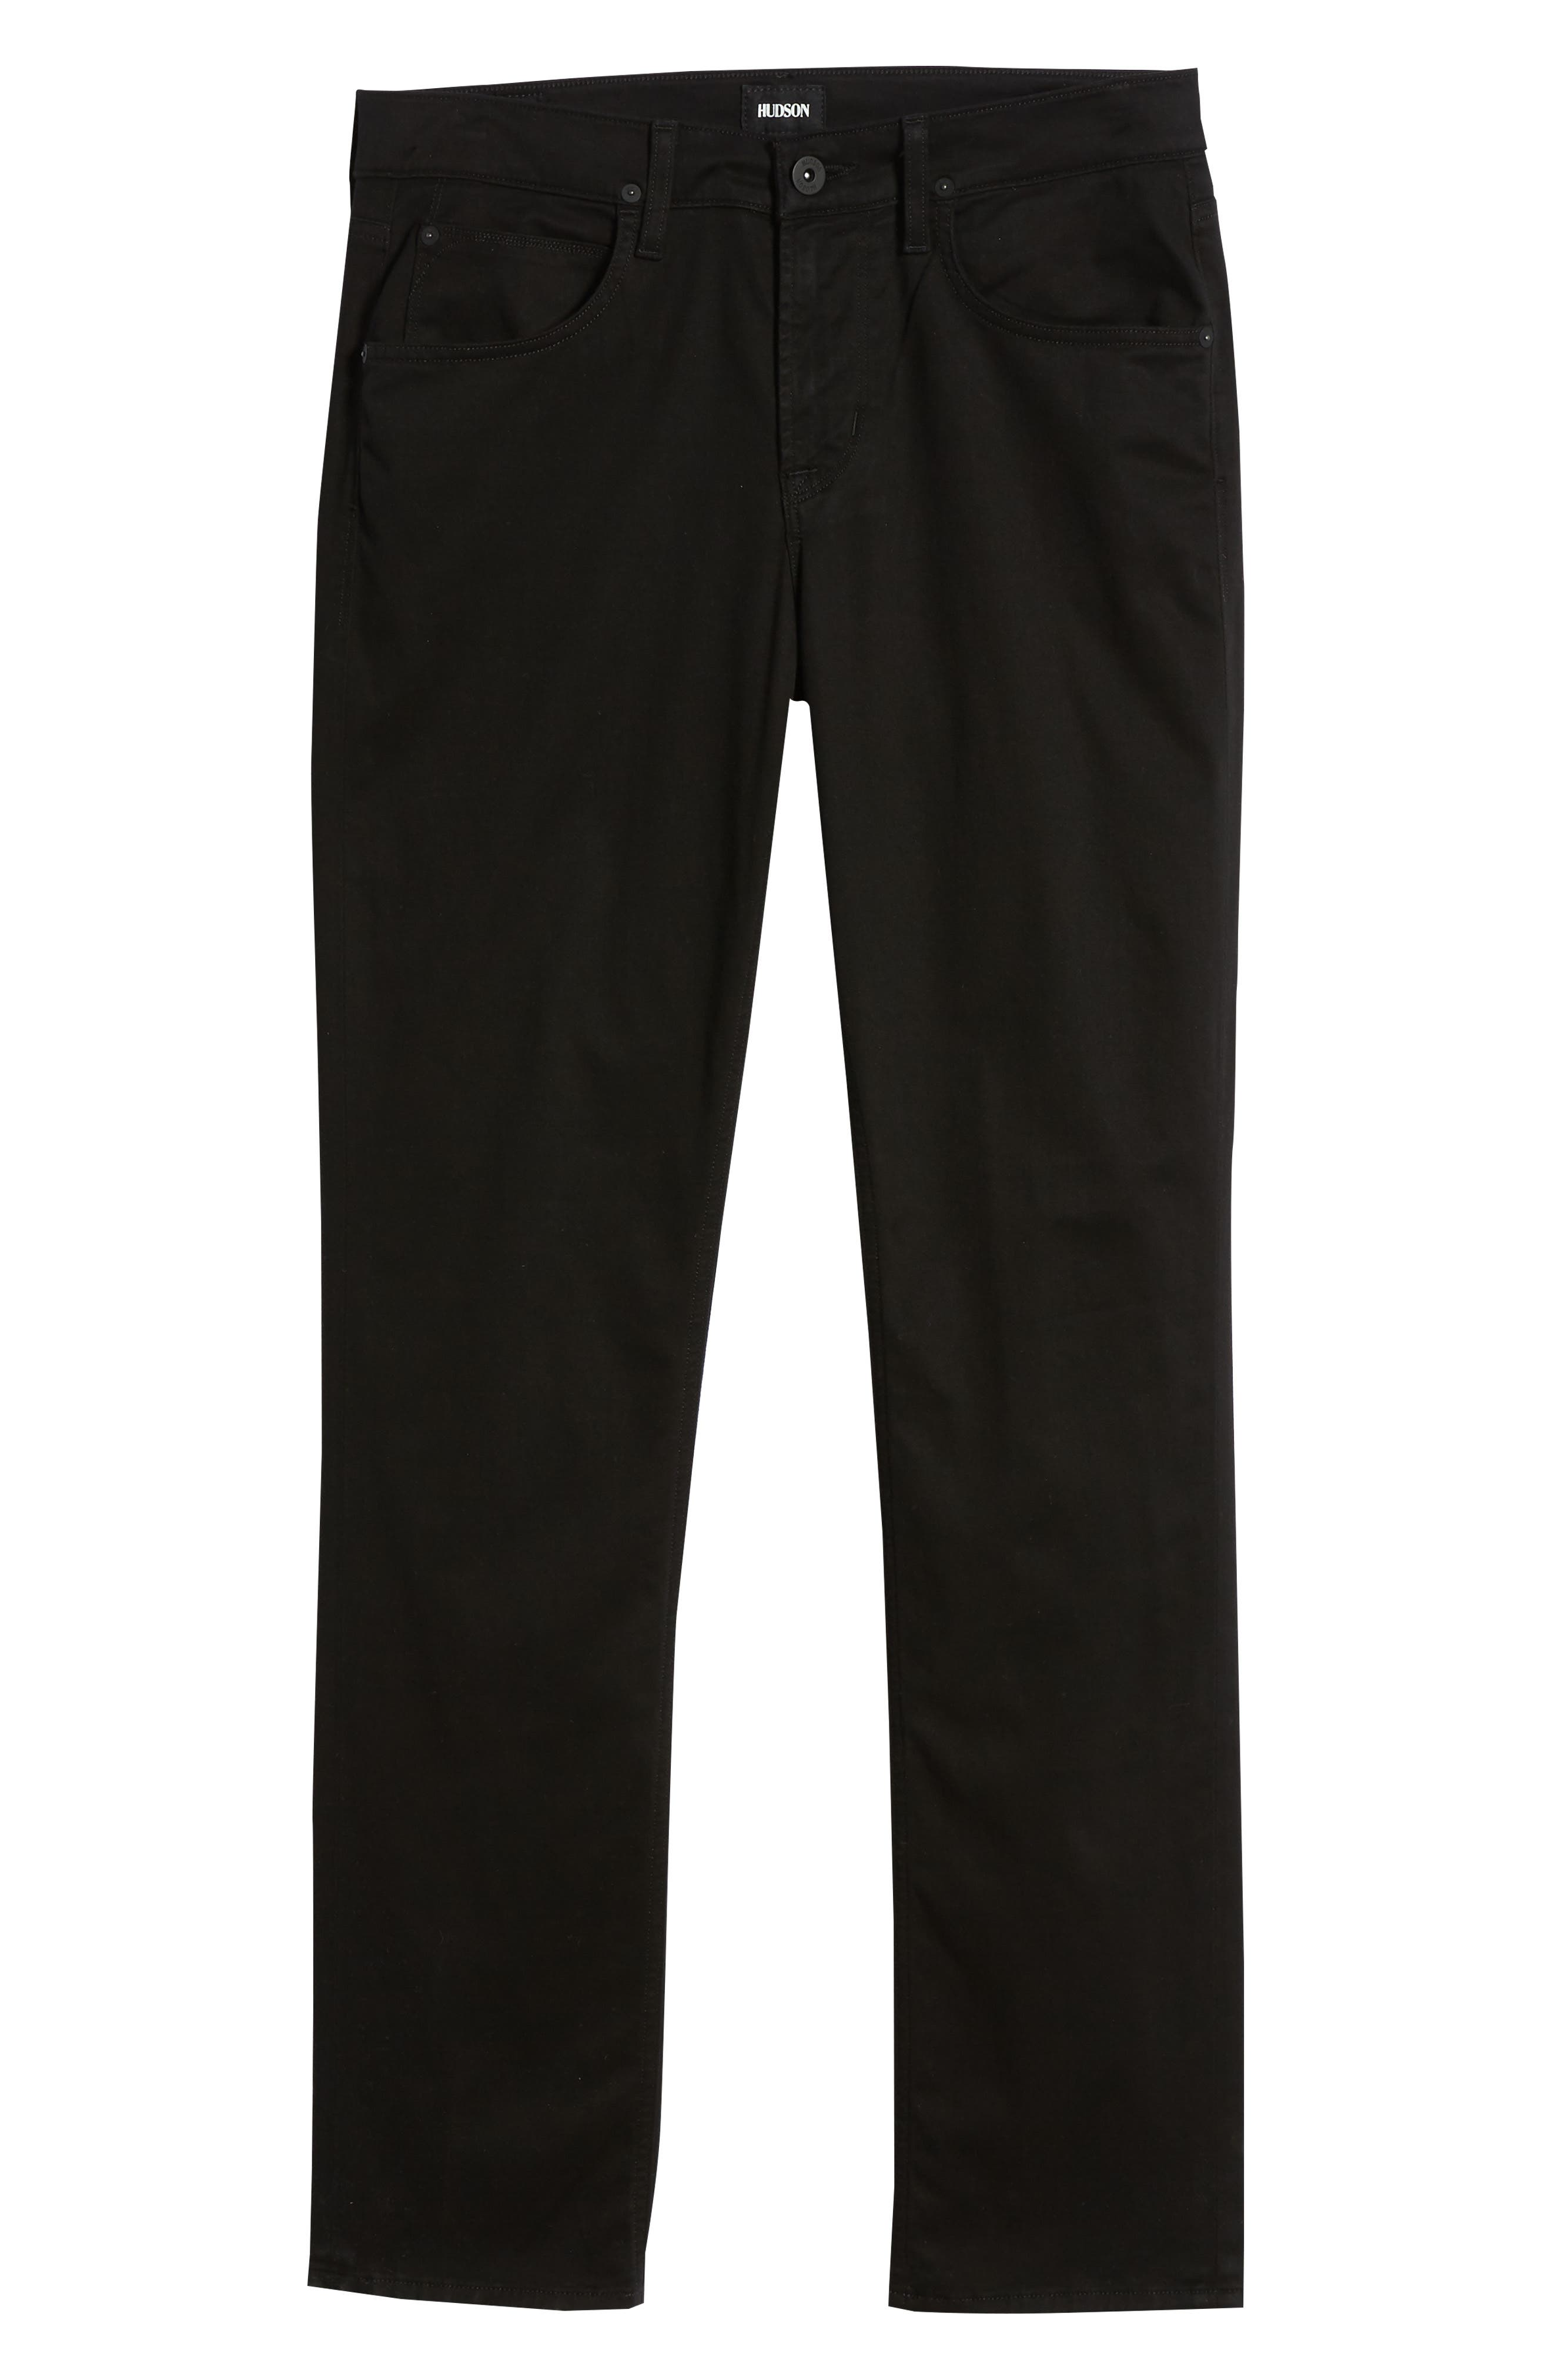 Byron Slim Straight Leg Jeans,                             Alternate thumbnail 6, color,                             Blackened